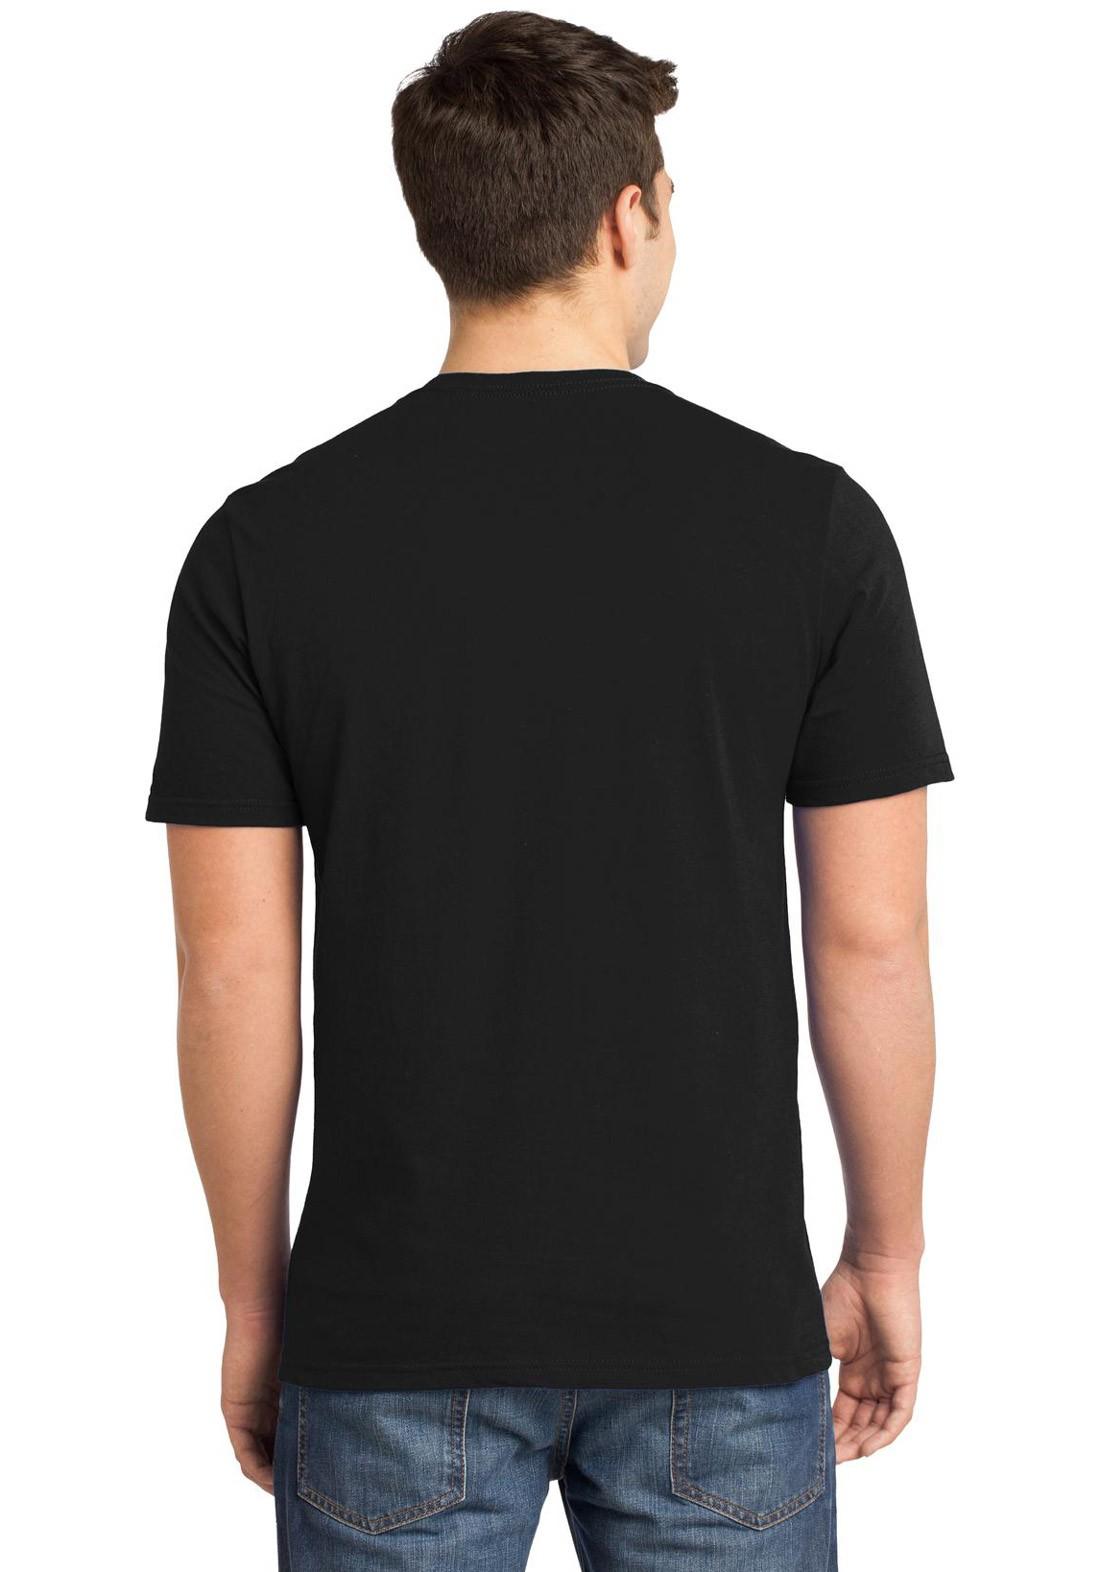 Camiseta Masculina Universitária Faculdade Odontologia